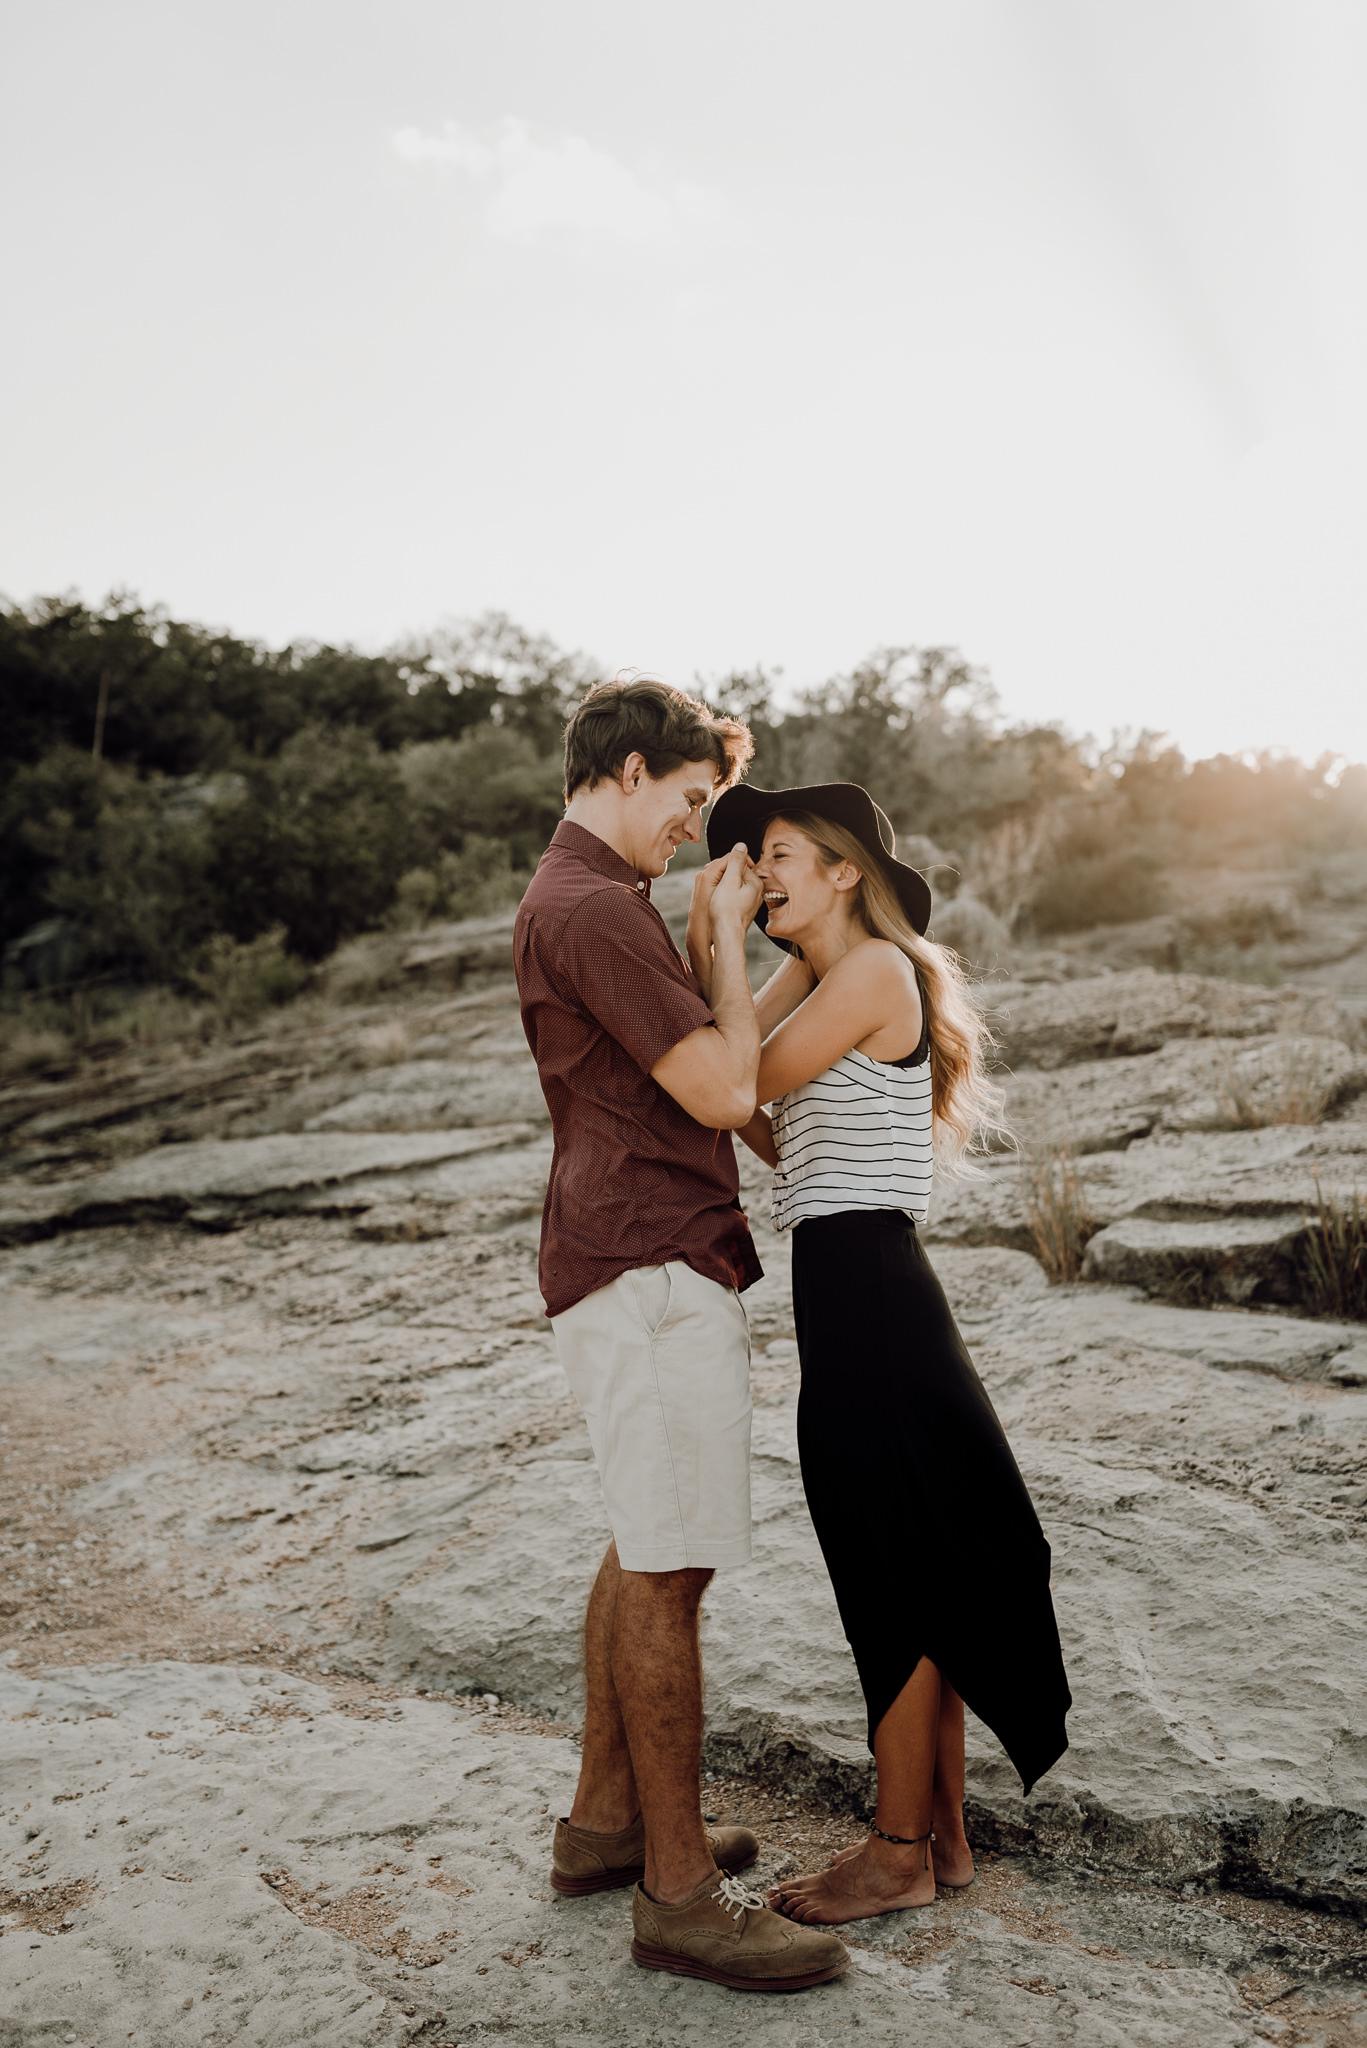 Michelle + Aron   Pederbales Falls Texas Engagement  Kristen Giles Photography - 028.jpg